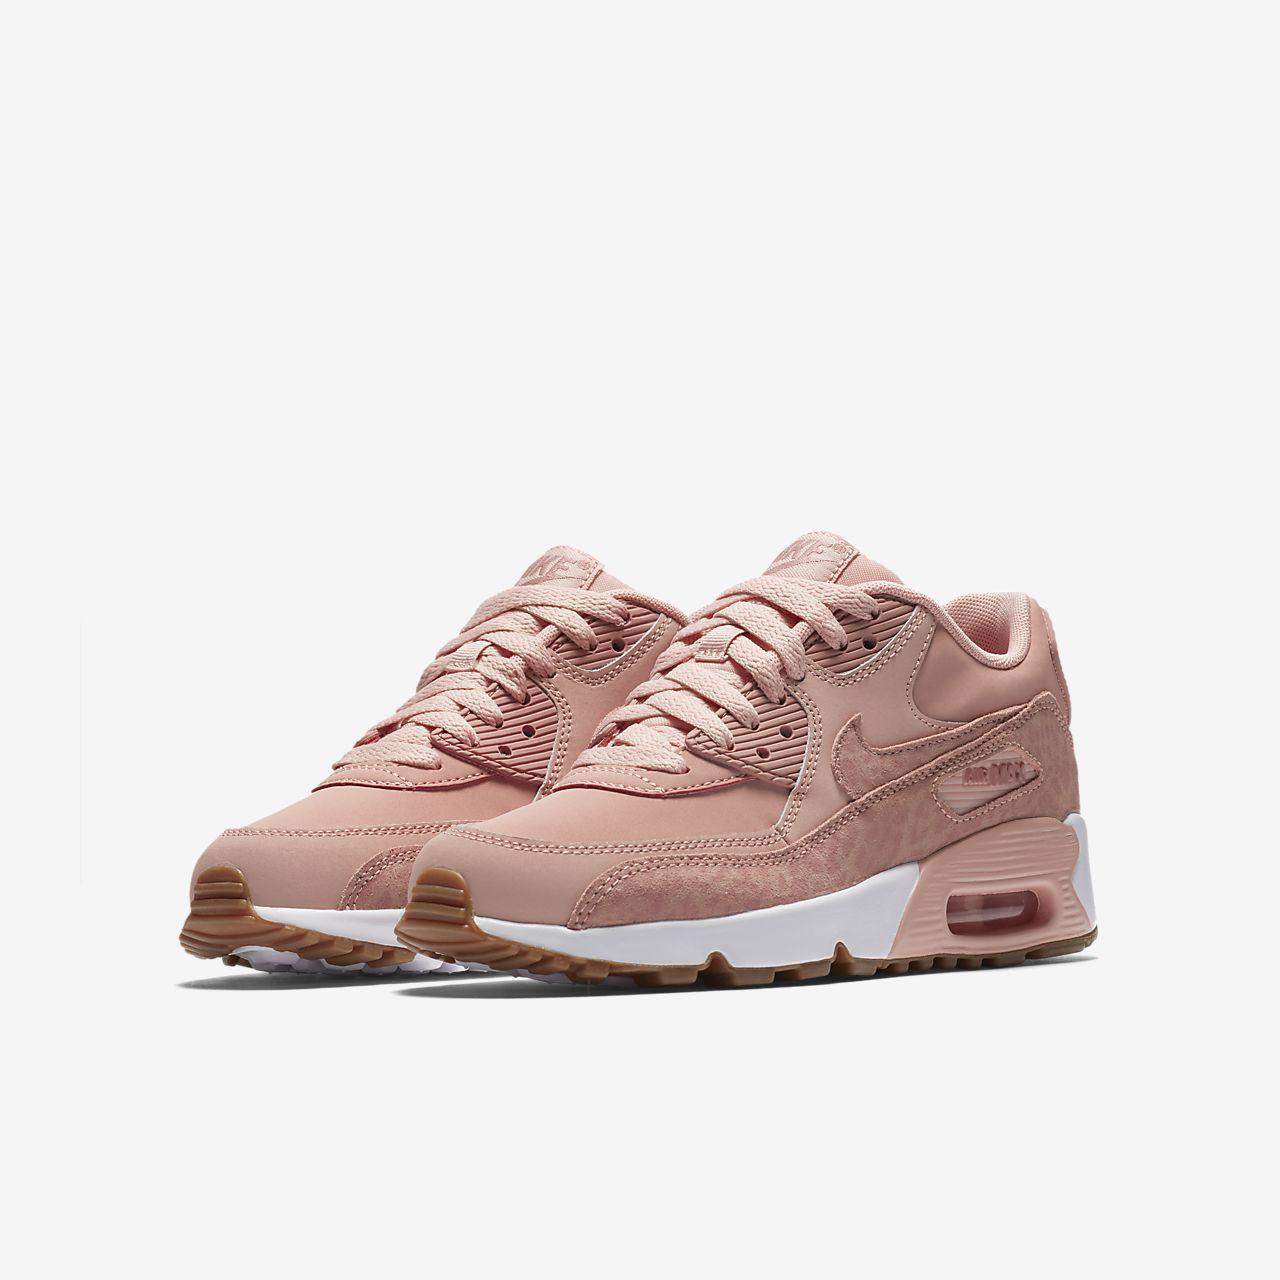 huge discount b03fc a2693 Nike Air Max 90 SE Leather Schuh für ältere Kinder . ...